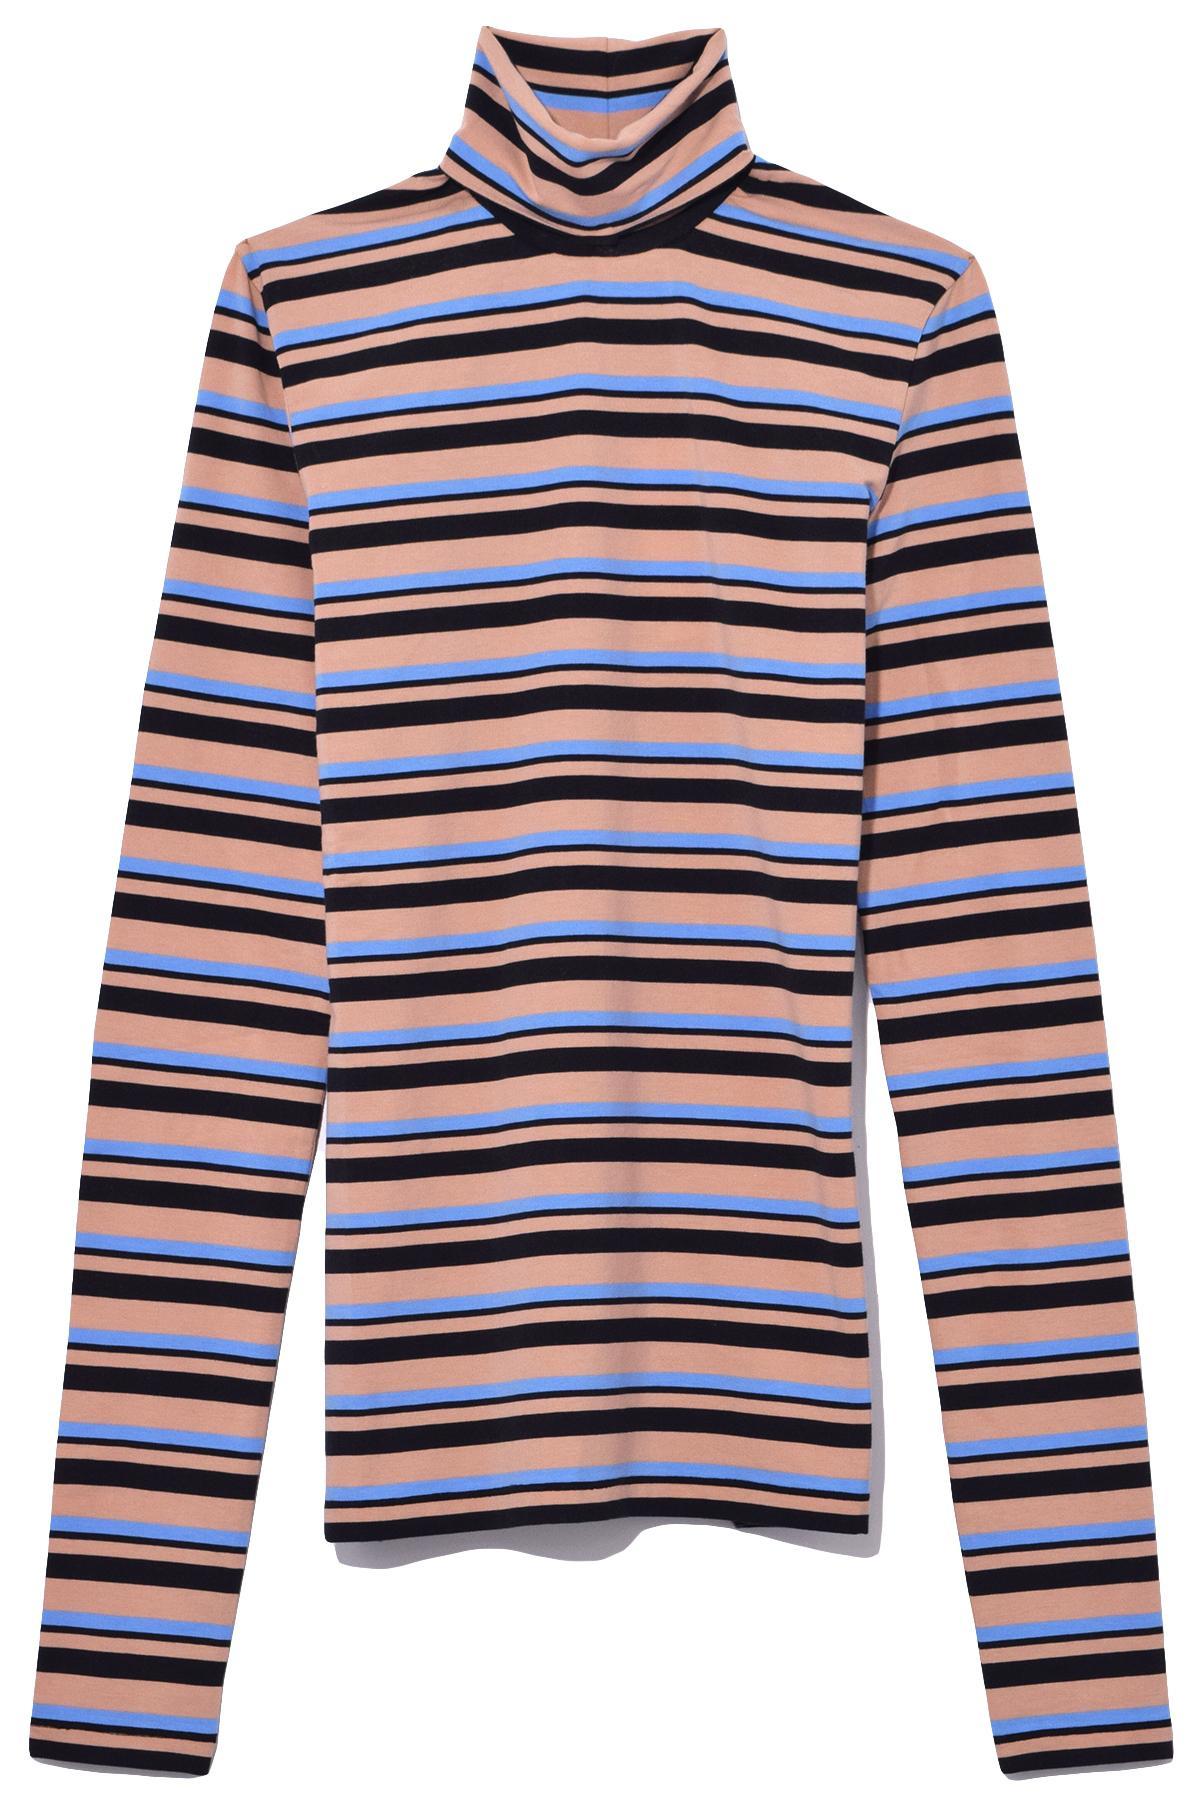 Schouler Blue Sheer Turtleneck Stripe Proenza Jersey In Women's 8wEddqxB